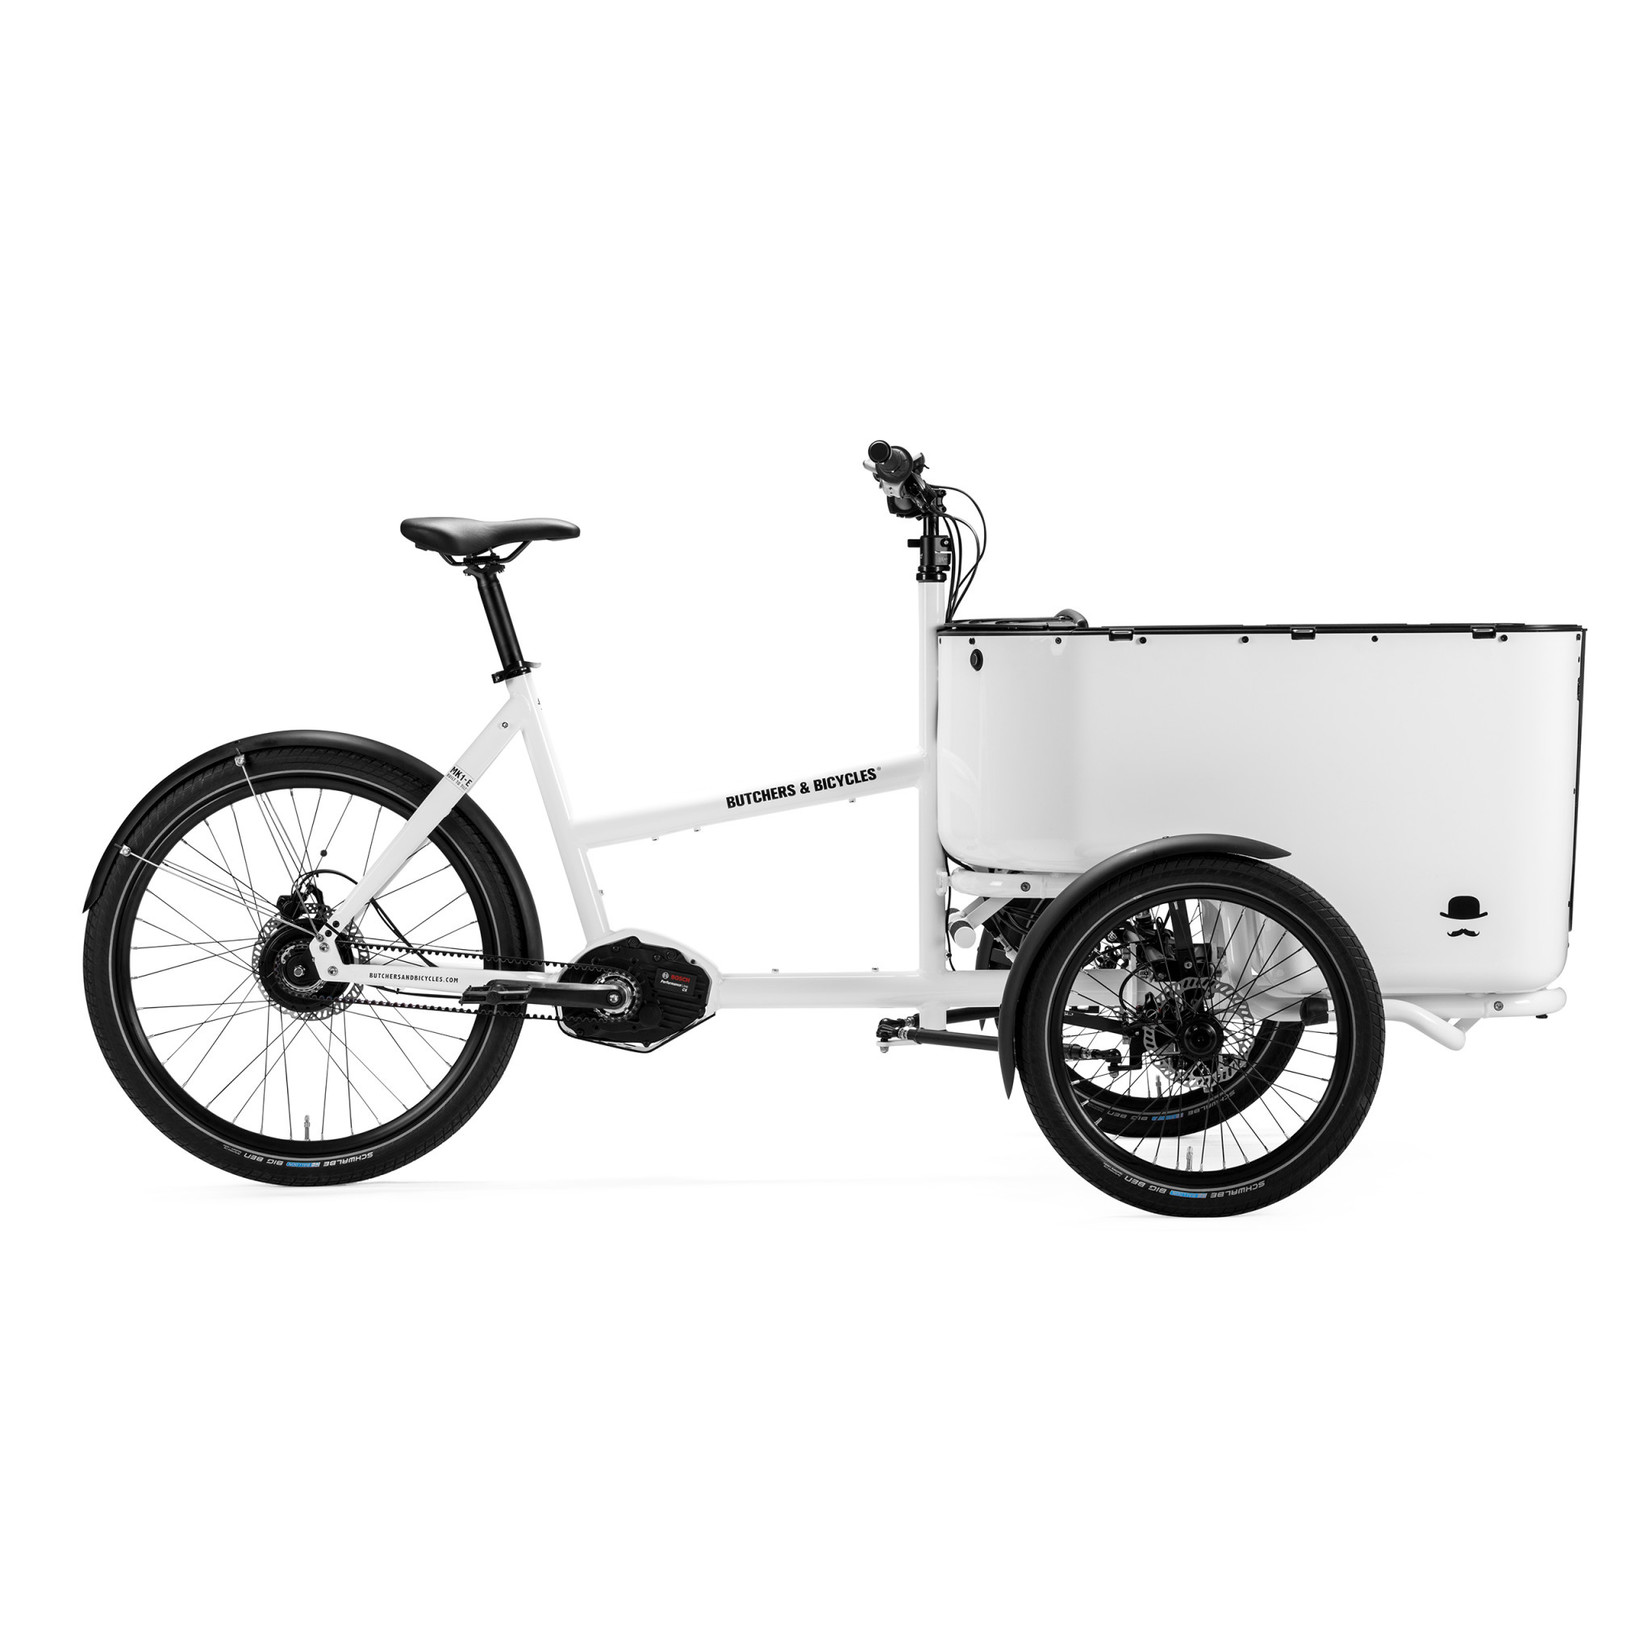 Butchers & Bicycles Butchers & Bicycles MK1-E Vario